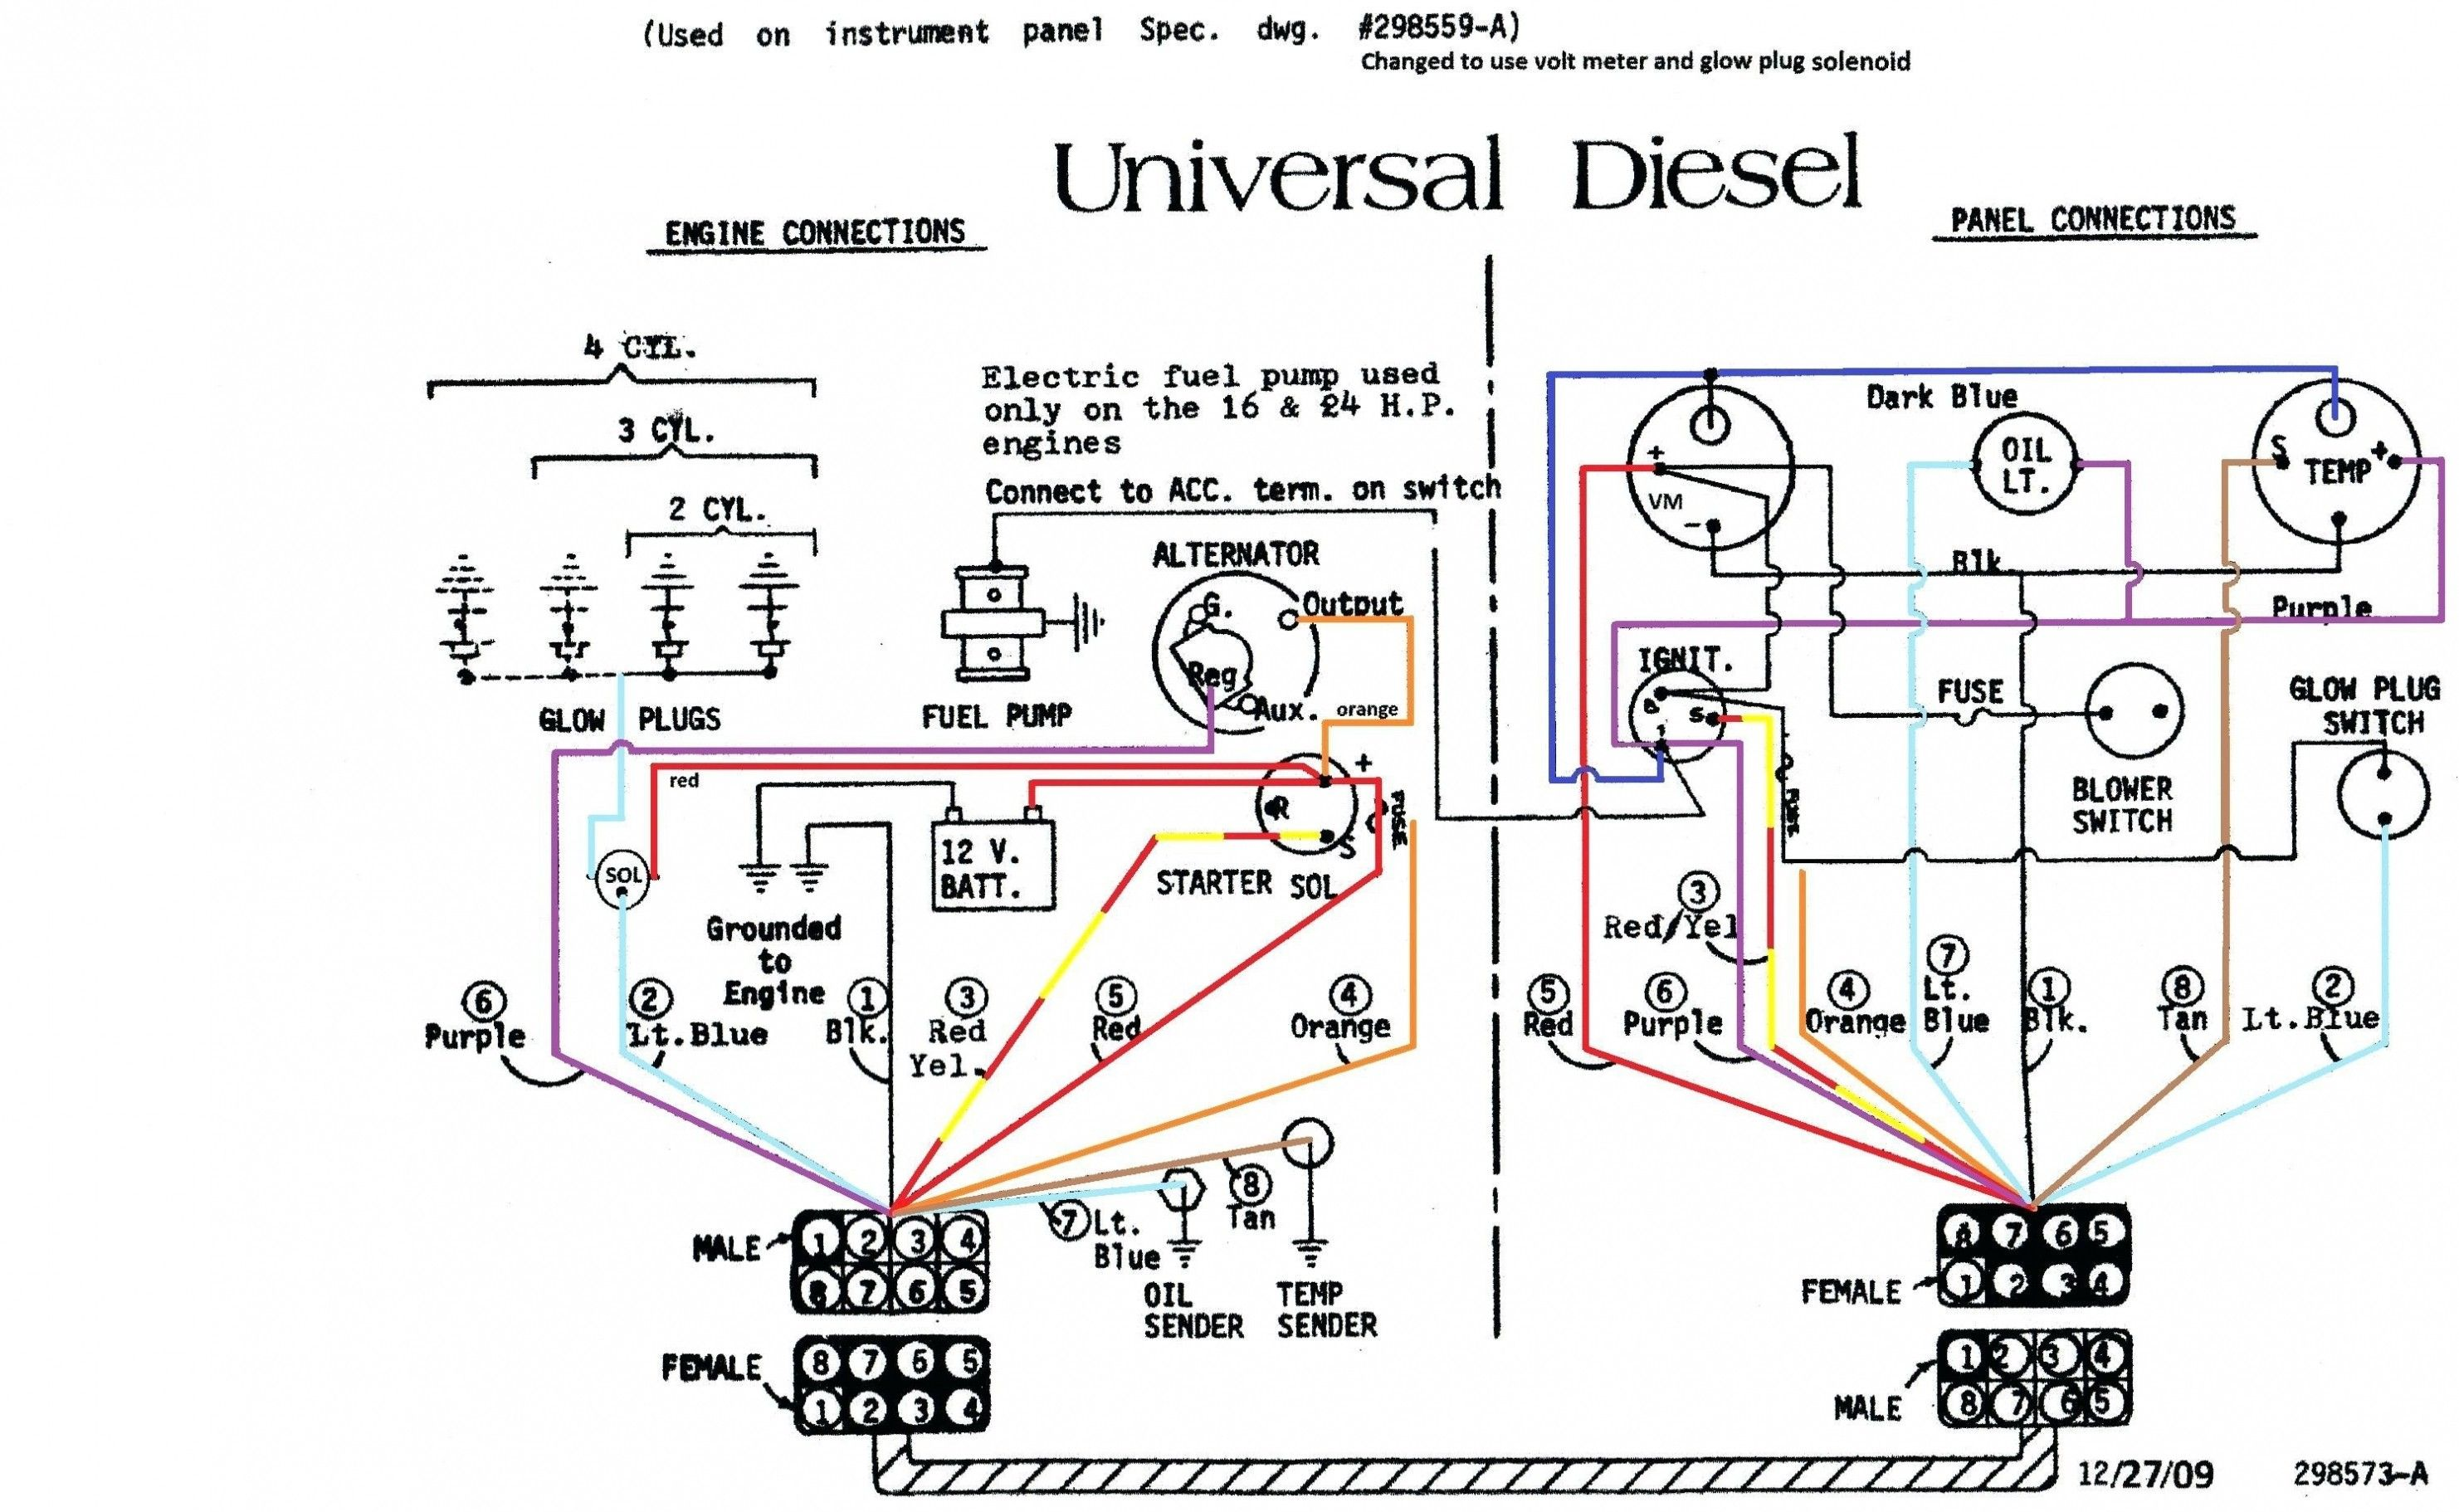 Awesome Three Wire Alternator Wiring Diagram Gm Diagrams Digramssample Diagramimages Wiringdiagramsample W Alternator Diesel Engine Trailer Wiring Diagram